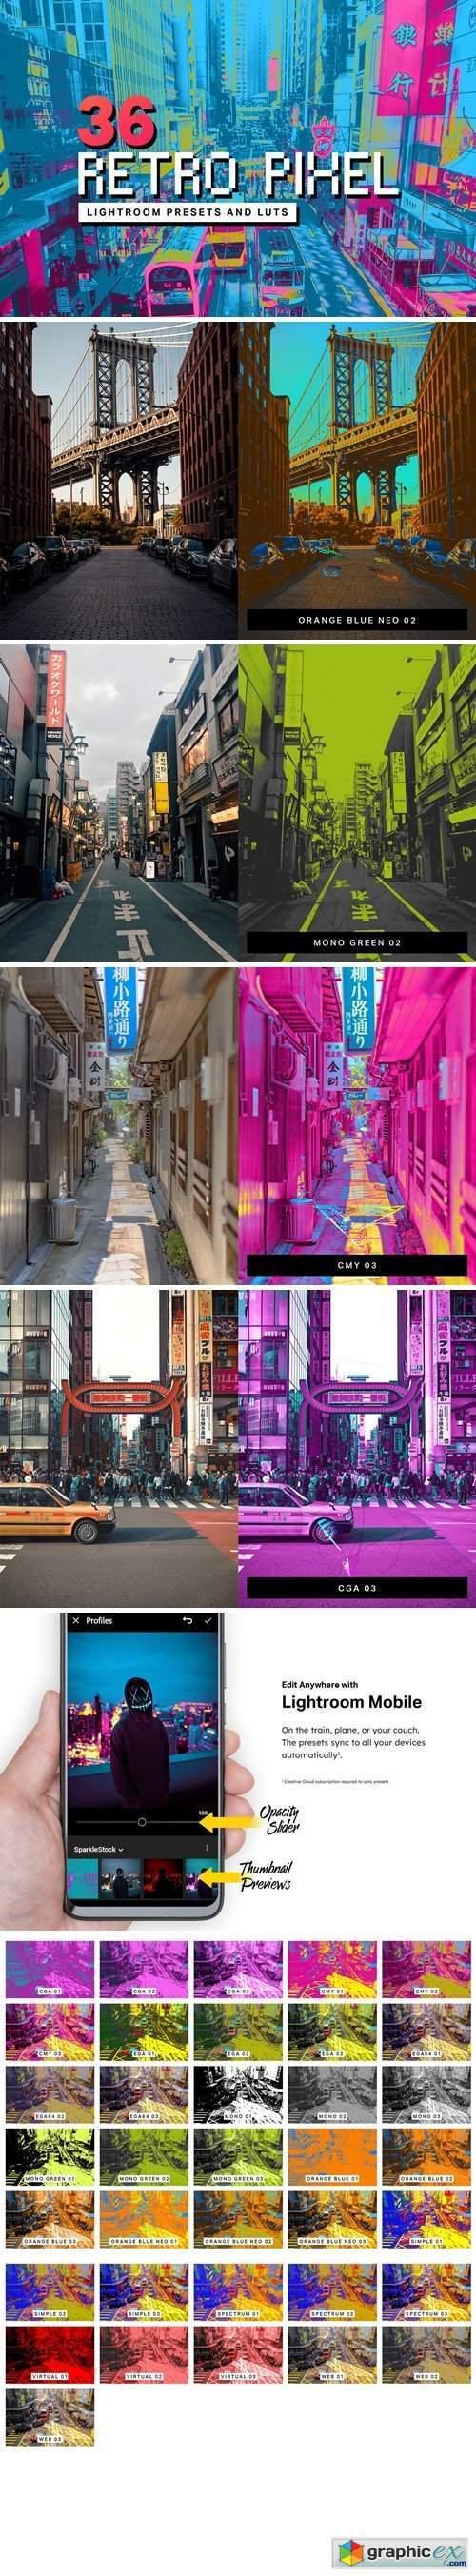 36 Retro Pixel Lightroom Presets and LUTs